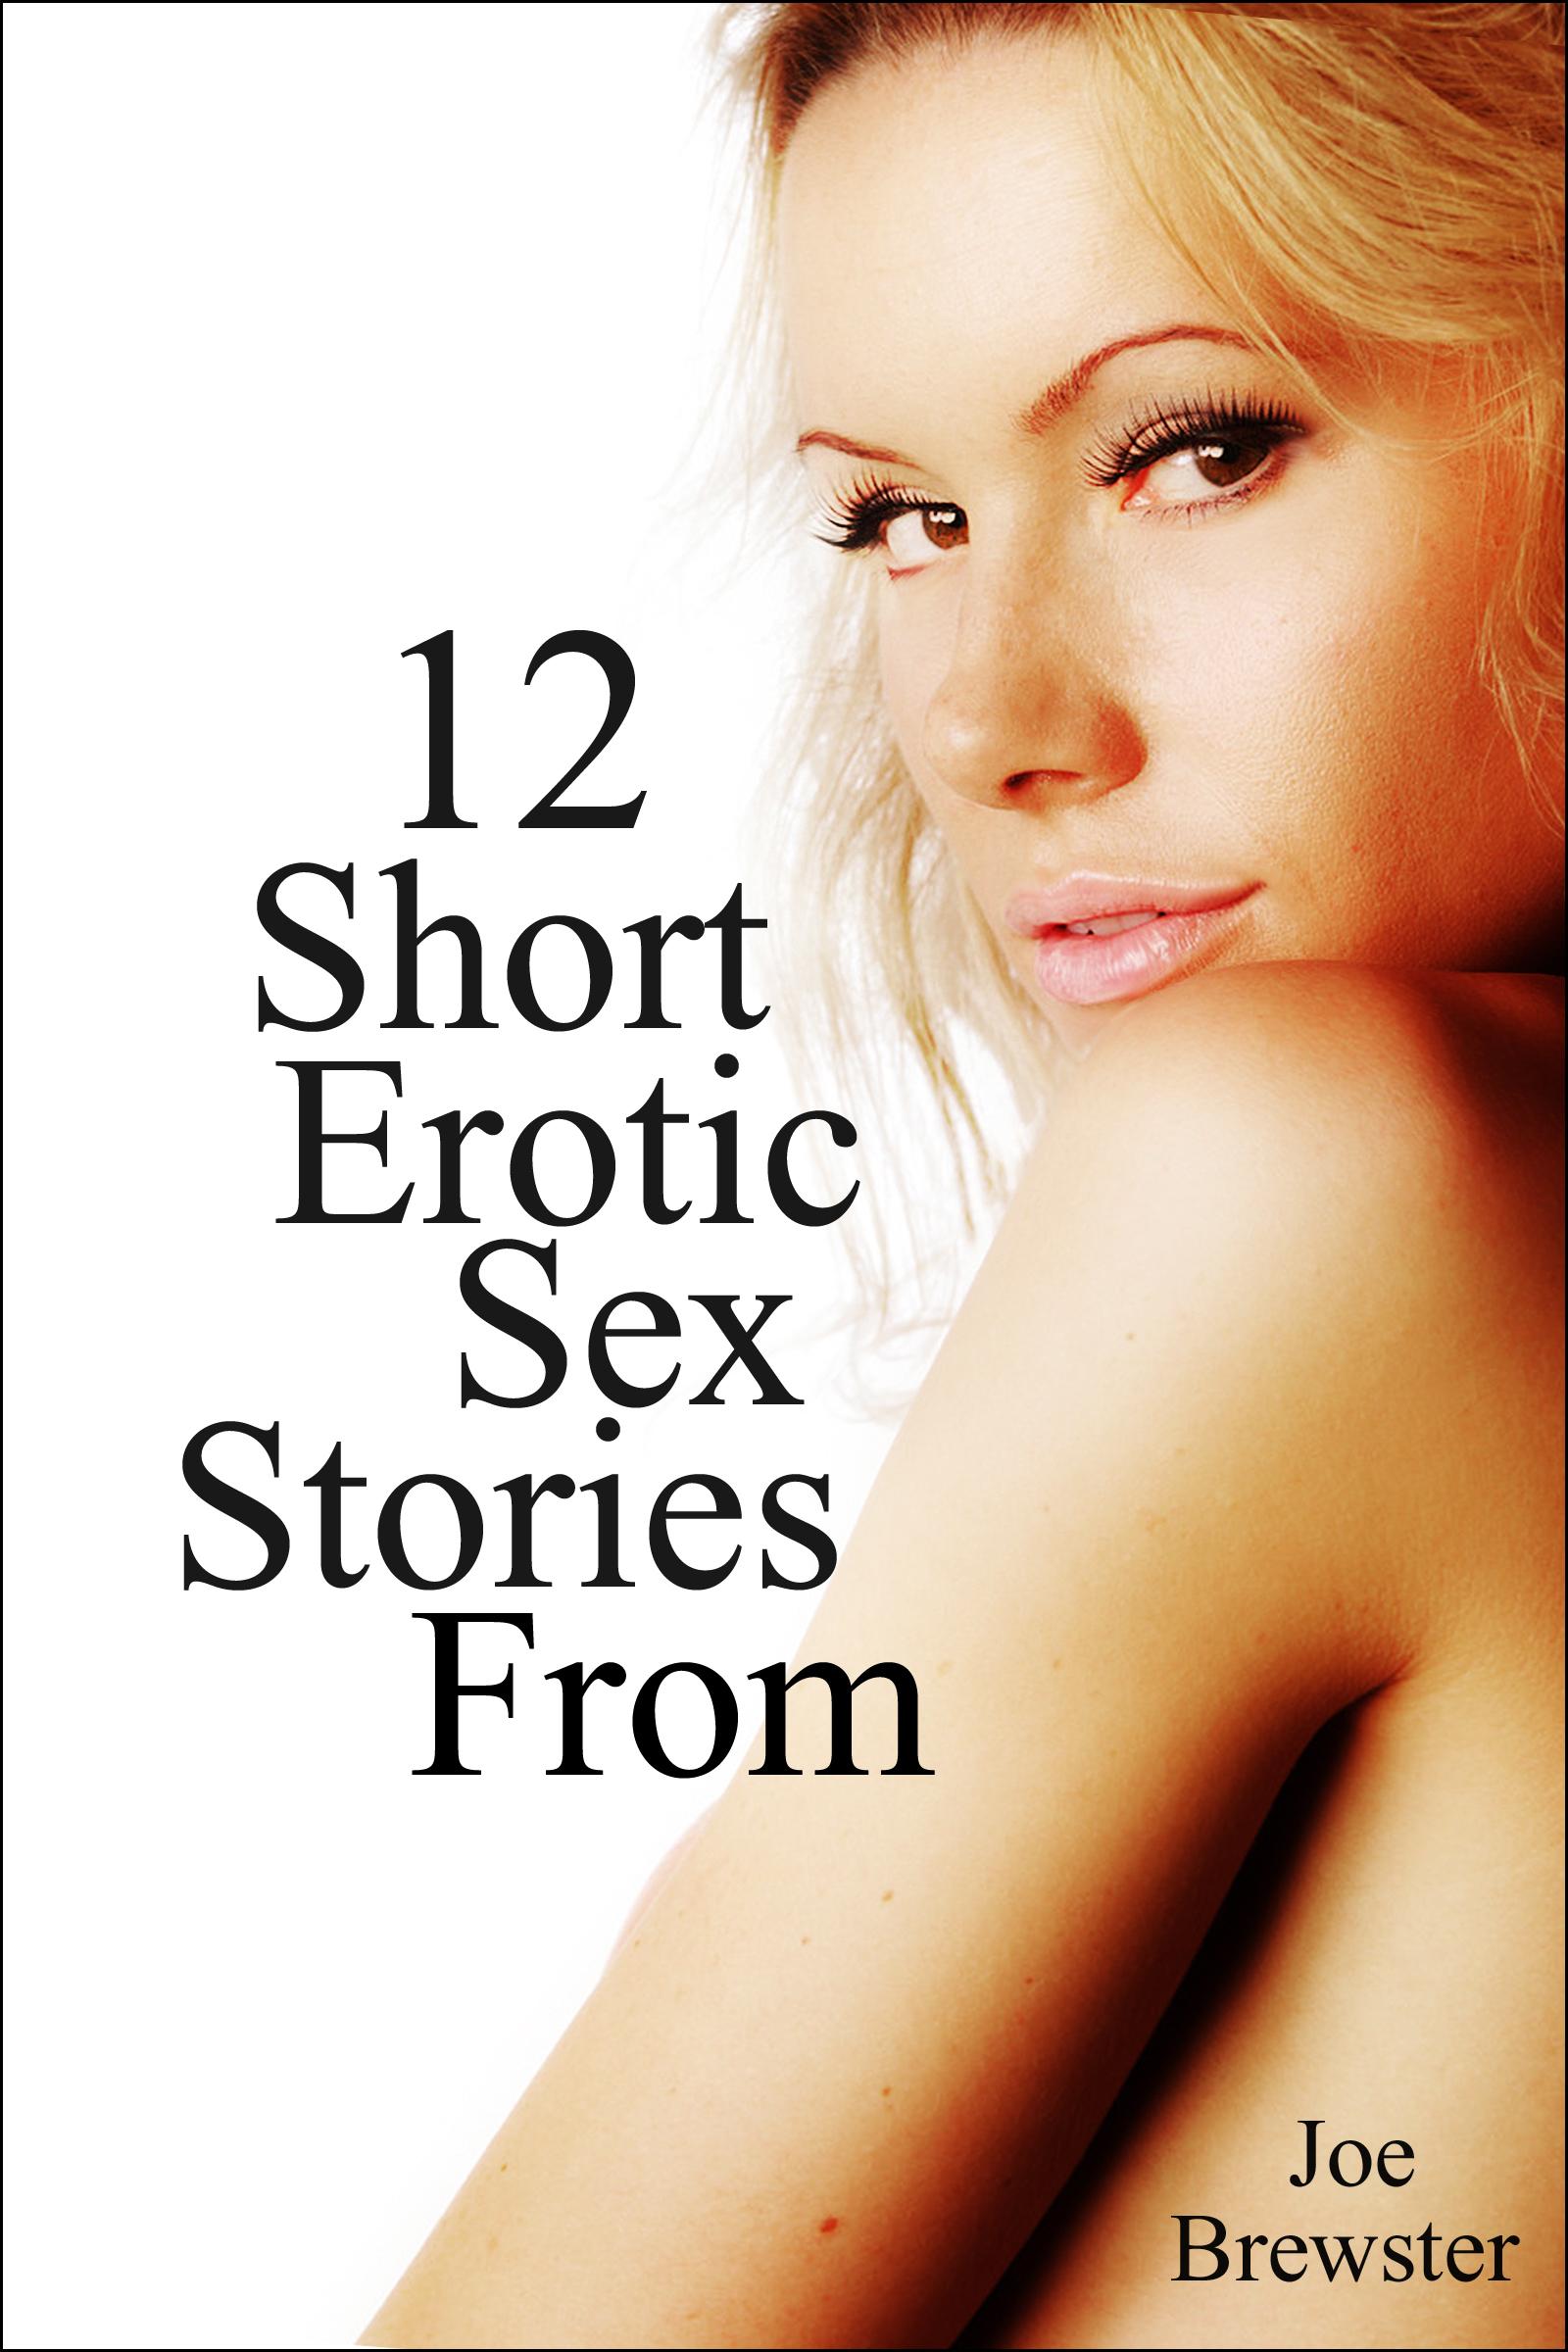 Commit error. Short erotic sex stories where you